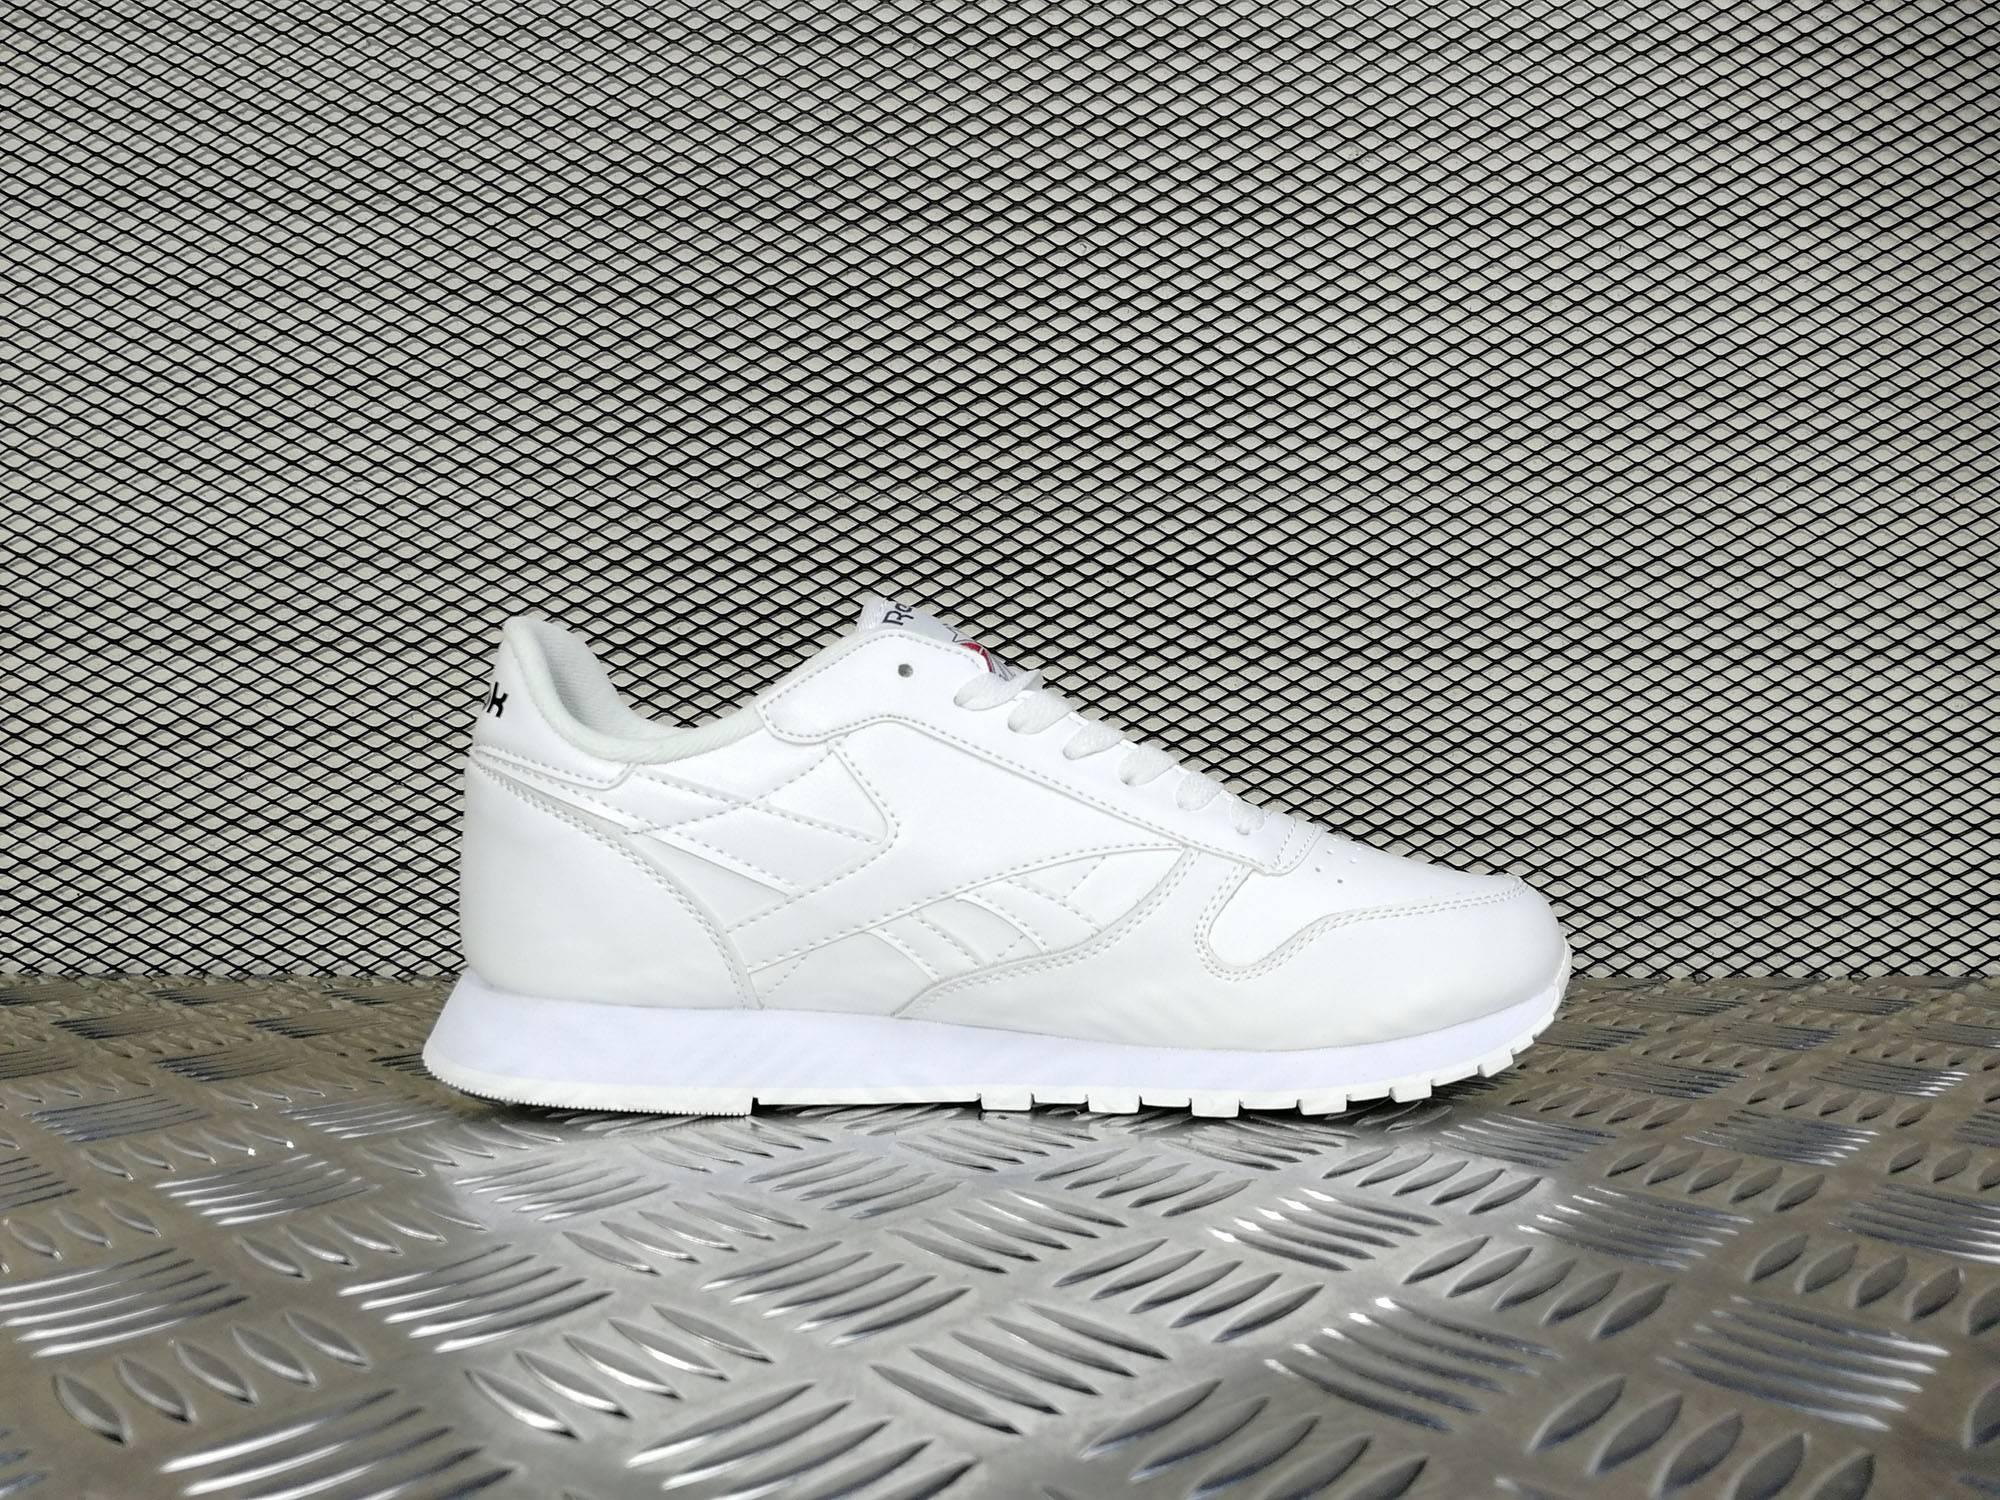 Купить женские кроссовки Reebok WMNS Classic Leather Triple White в ... fcc22d9a8e5